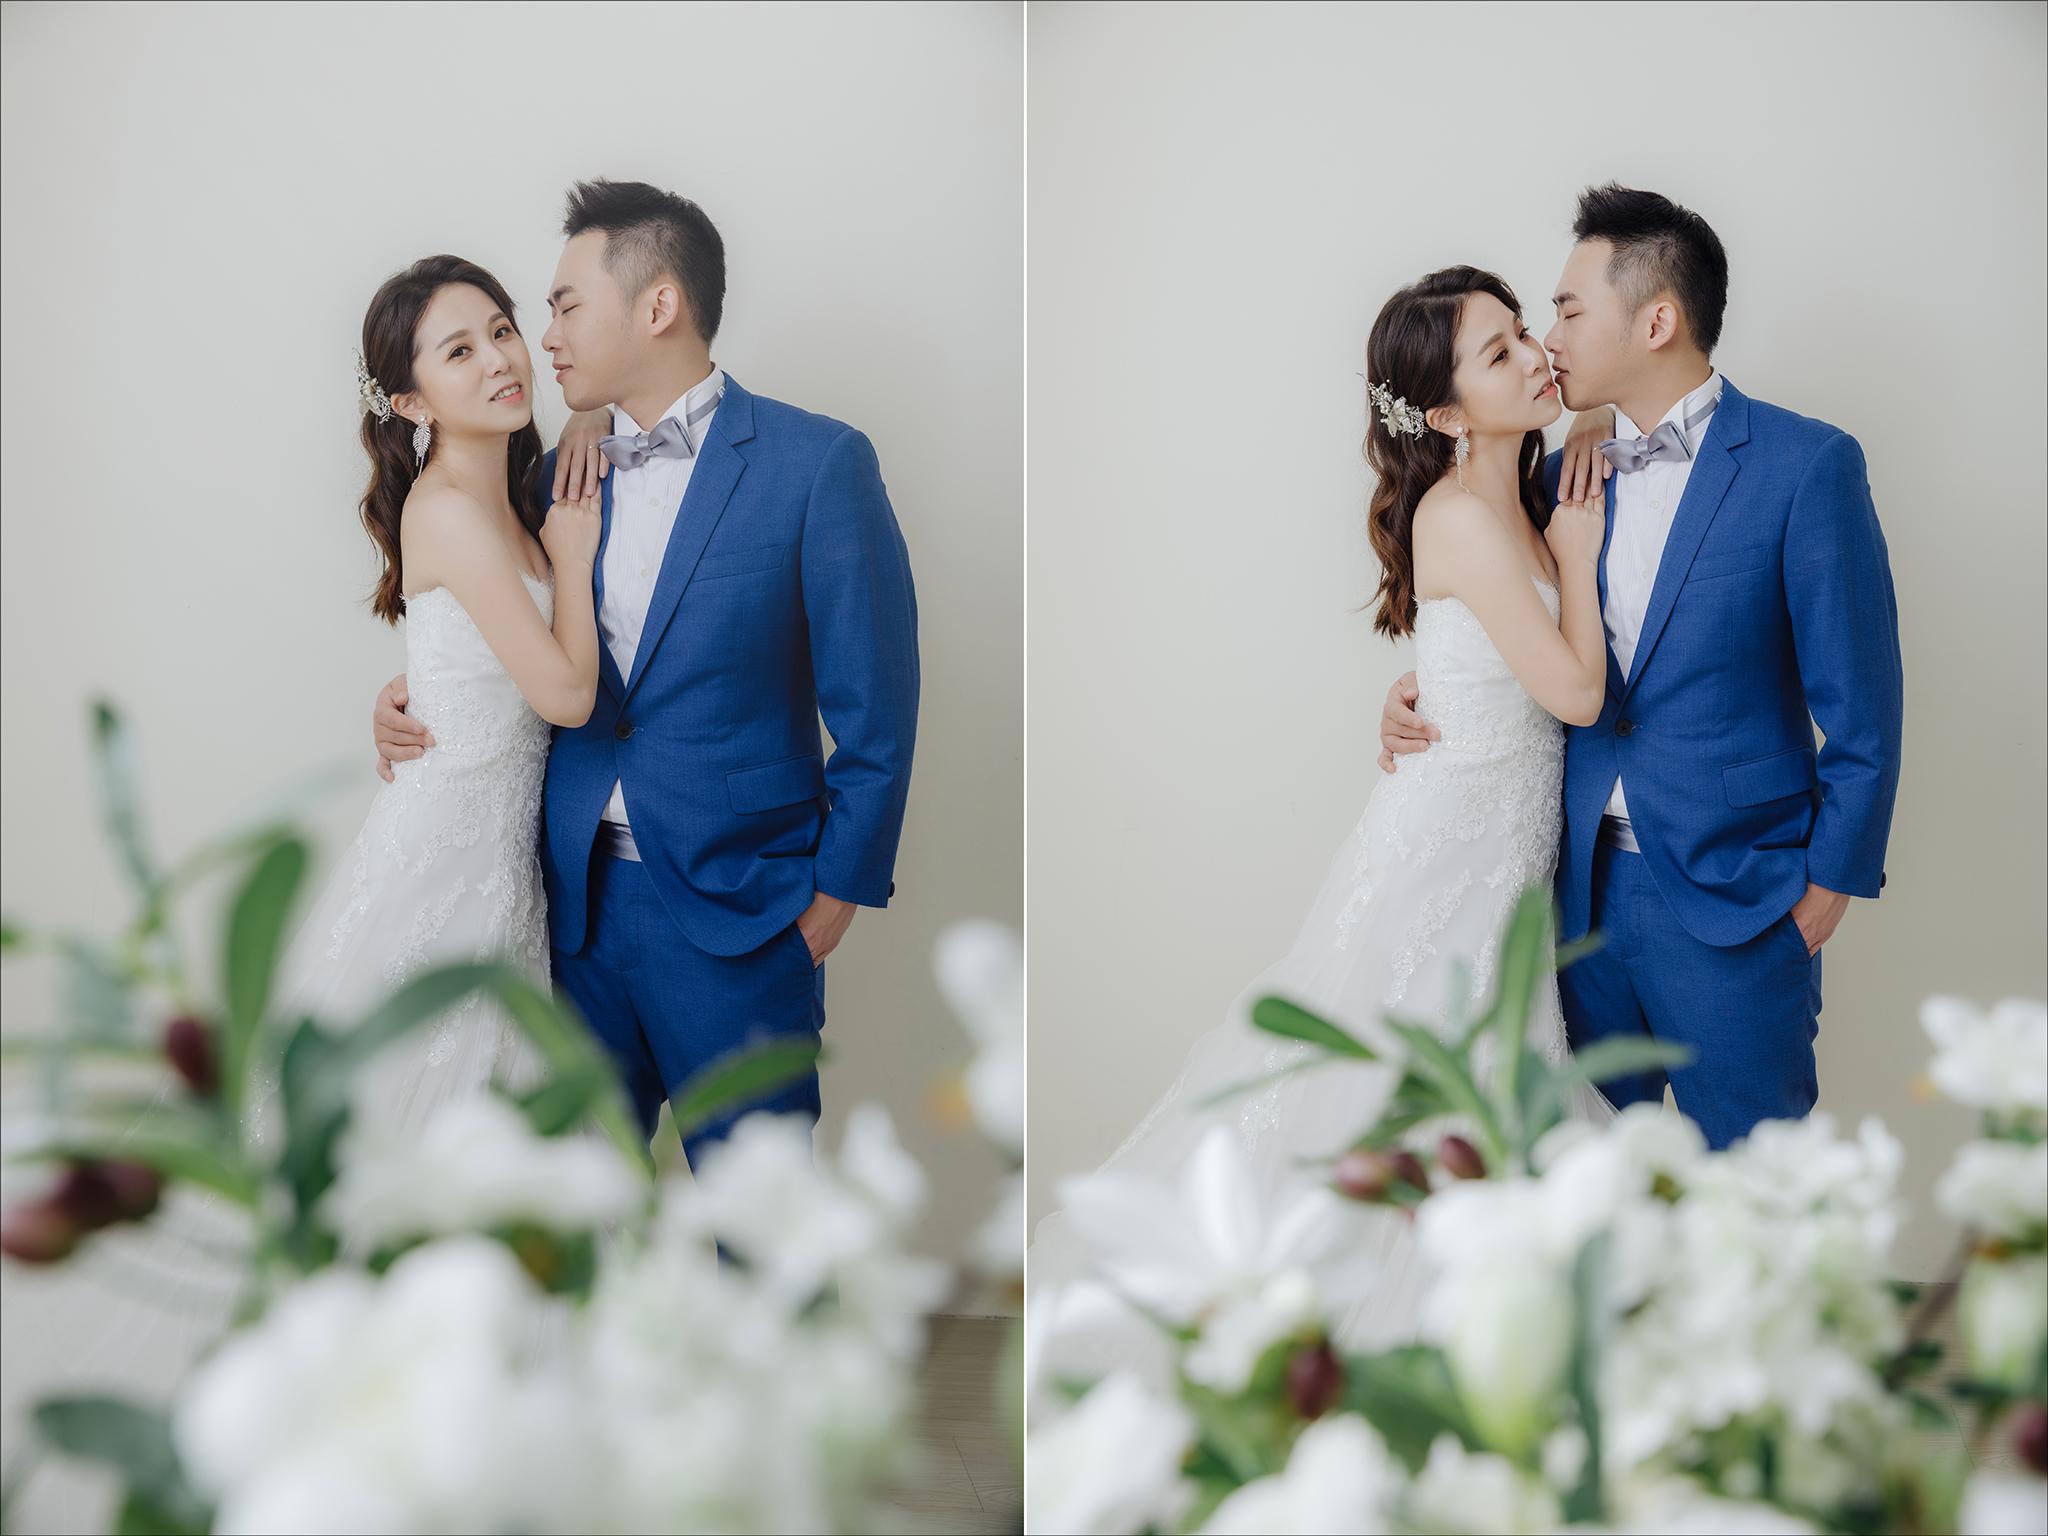 49599524492 99637e35c7 o - 【自助婚紗】+啟安&虹虹+